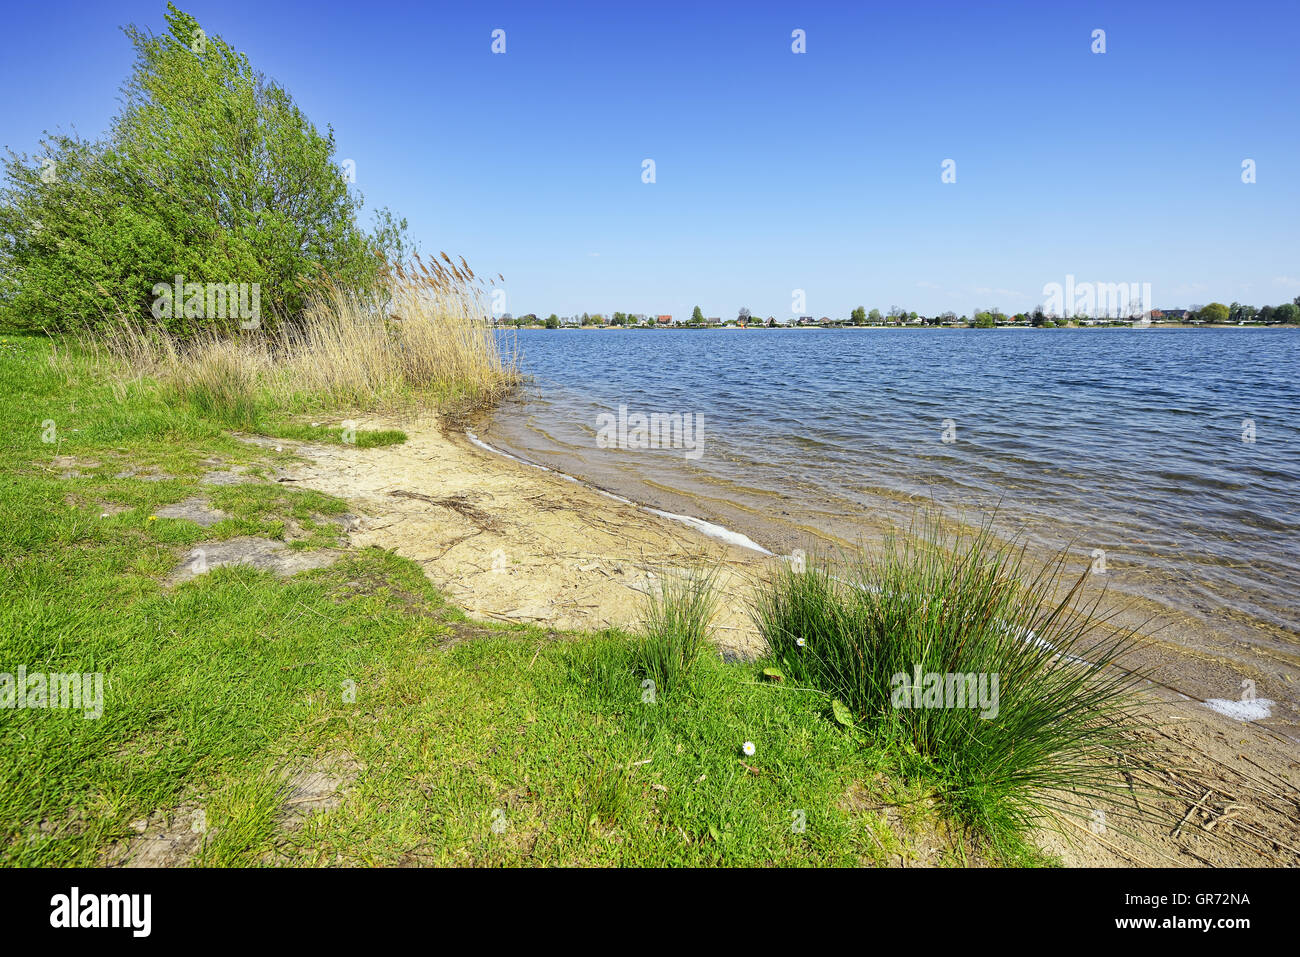 Hohendeicher Lake In Hamburg, Germany - Stock Image